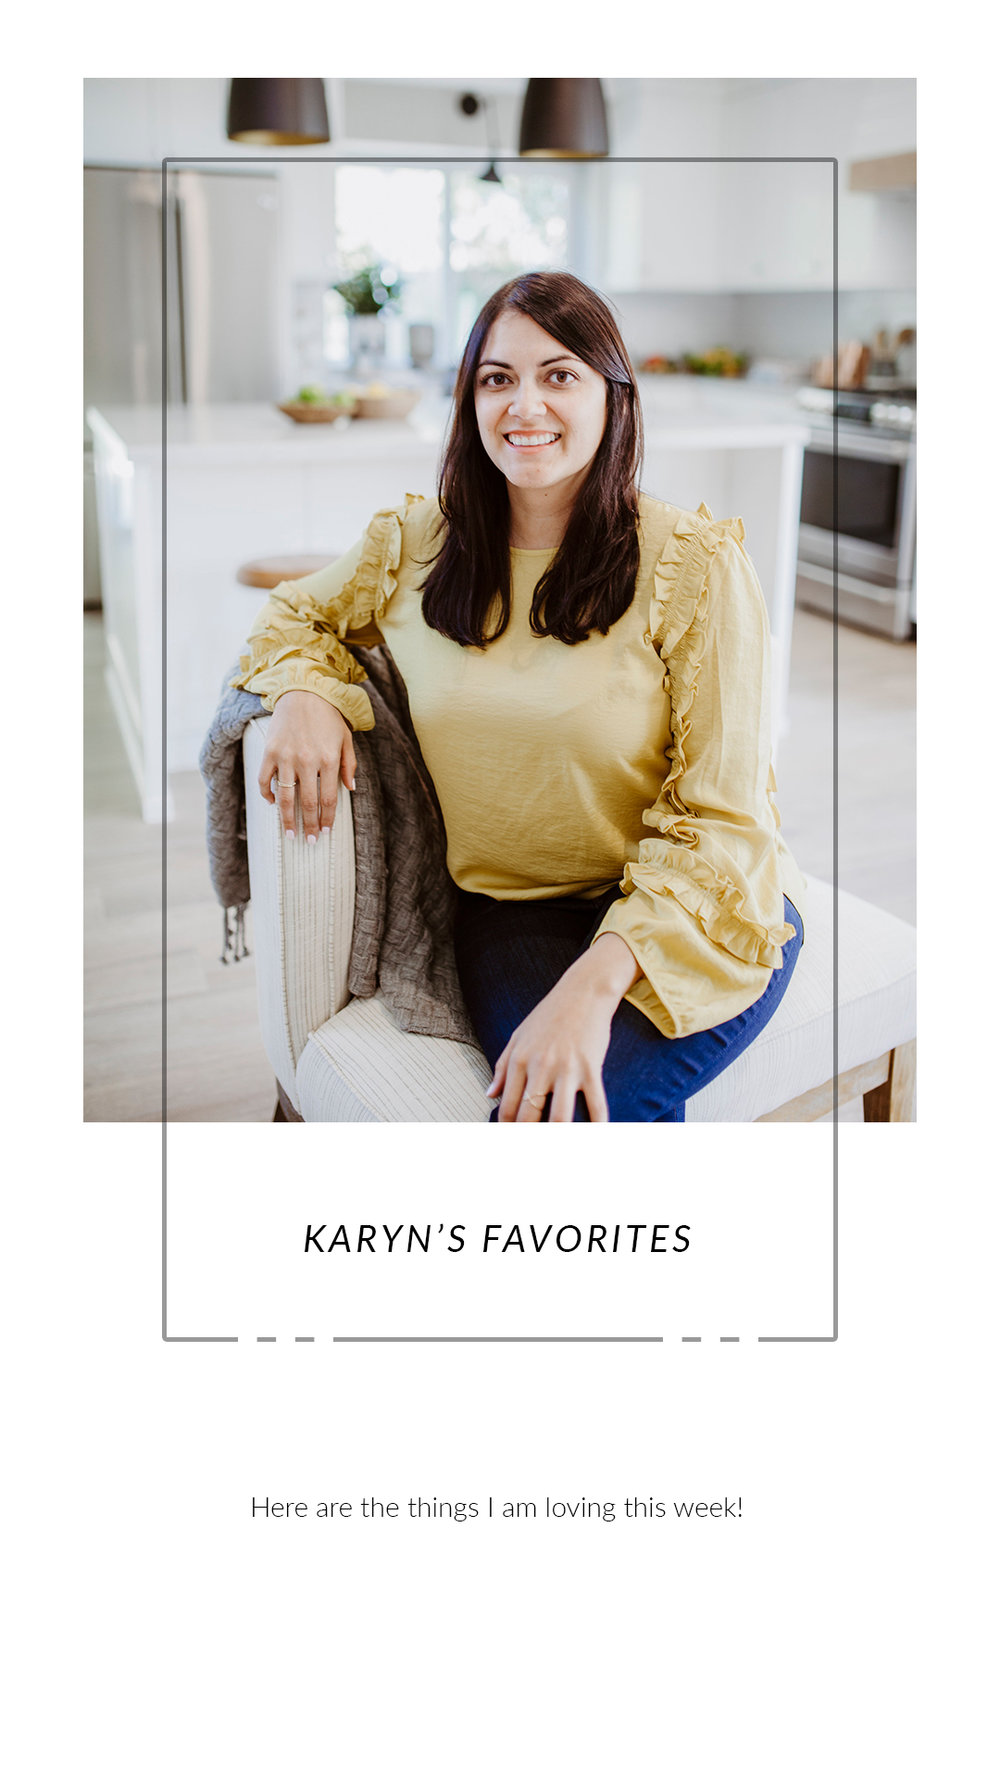 Karyns favorites.jpg